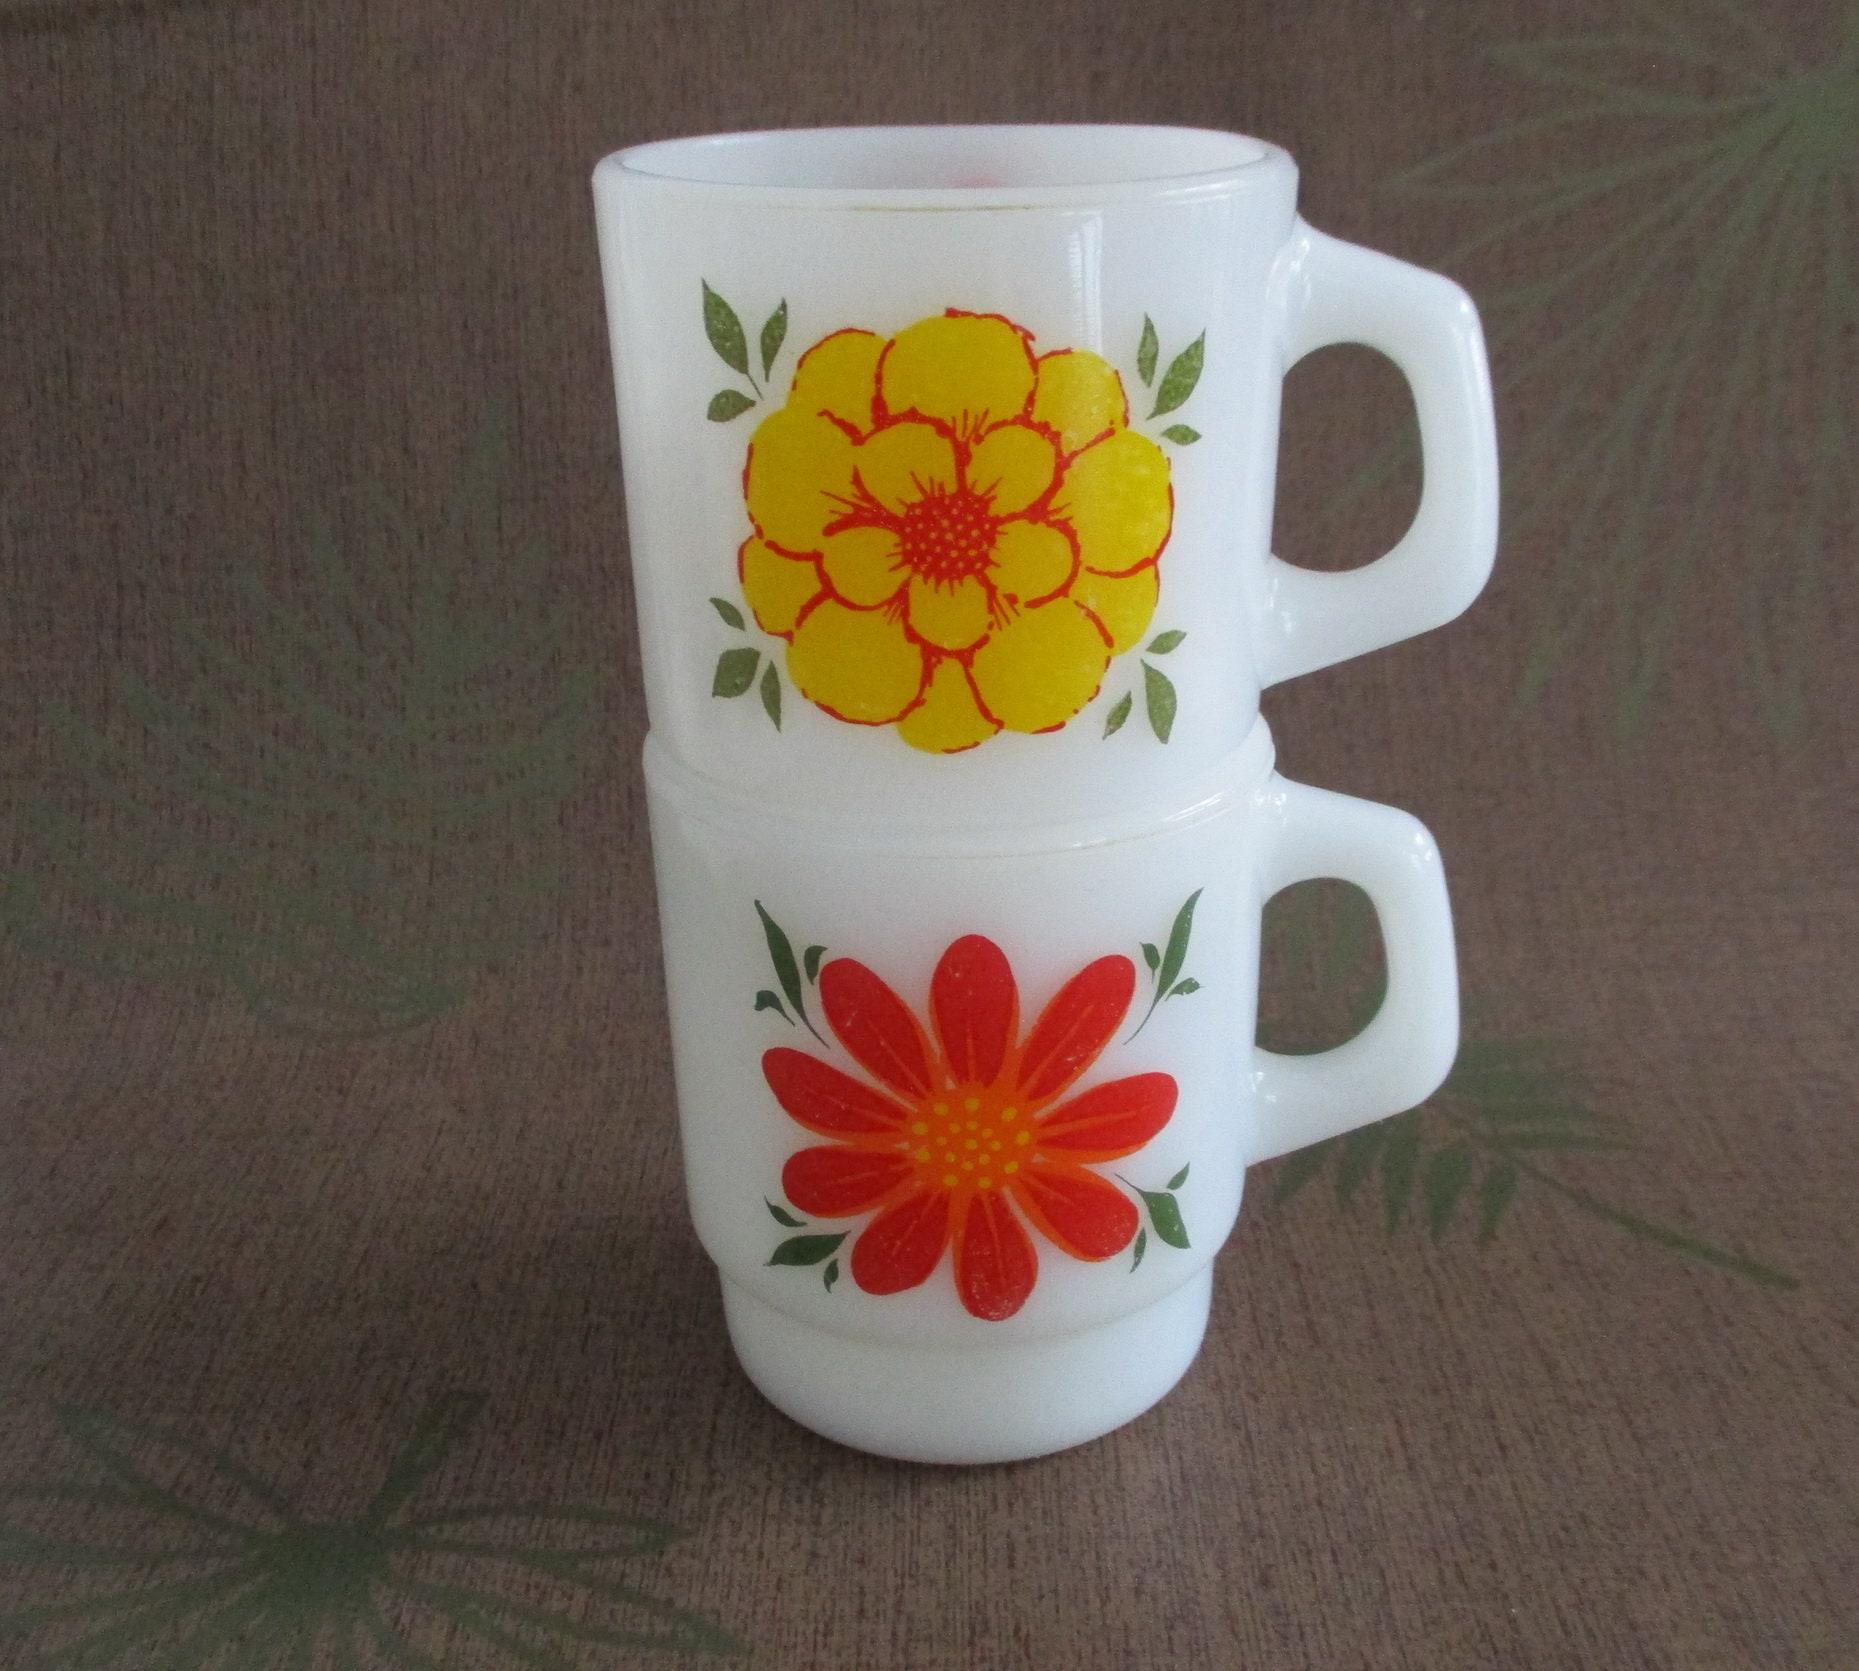 "3.5"" H x 3"" D Vintage Orange Milk Glass Mug White inside."